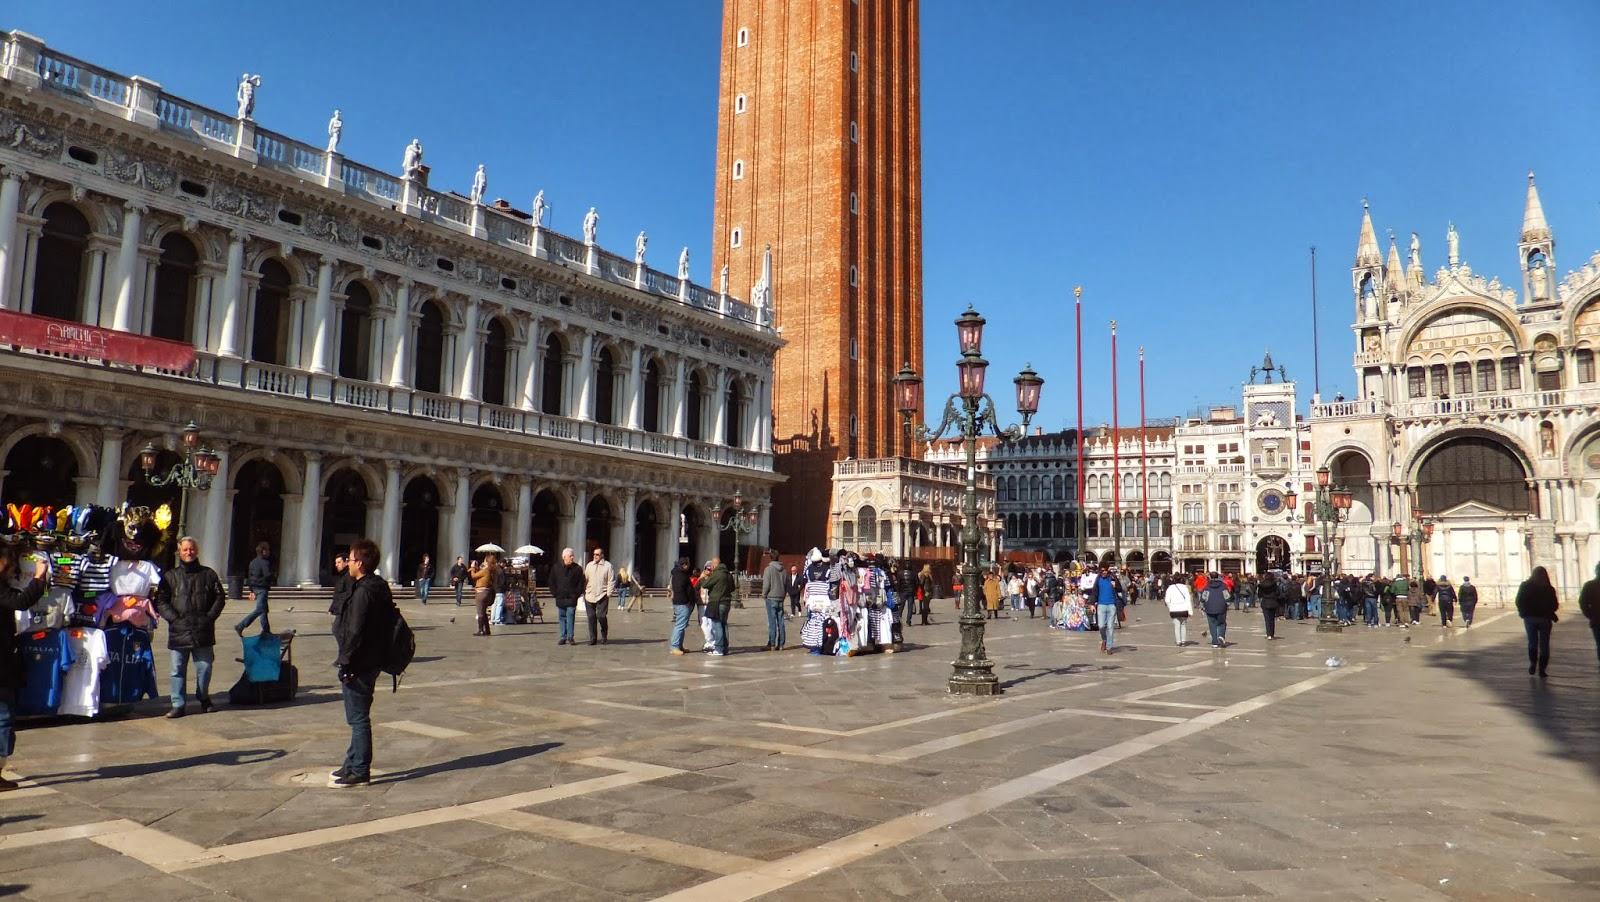 Piazza San Marco, Canalazzo, Venecia, Venezia, Italia, Elisa N, Blog de Viajes, Lifestyle, Travel